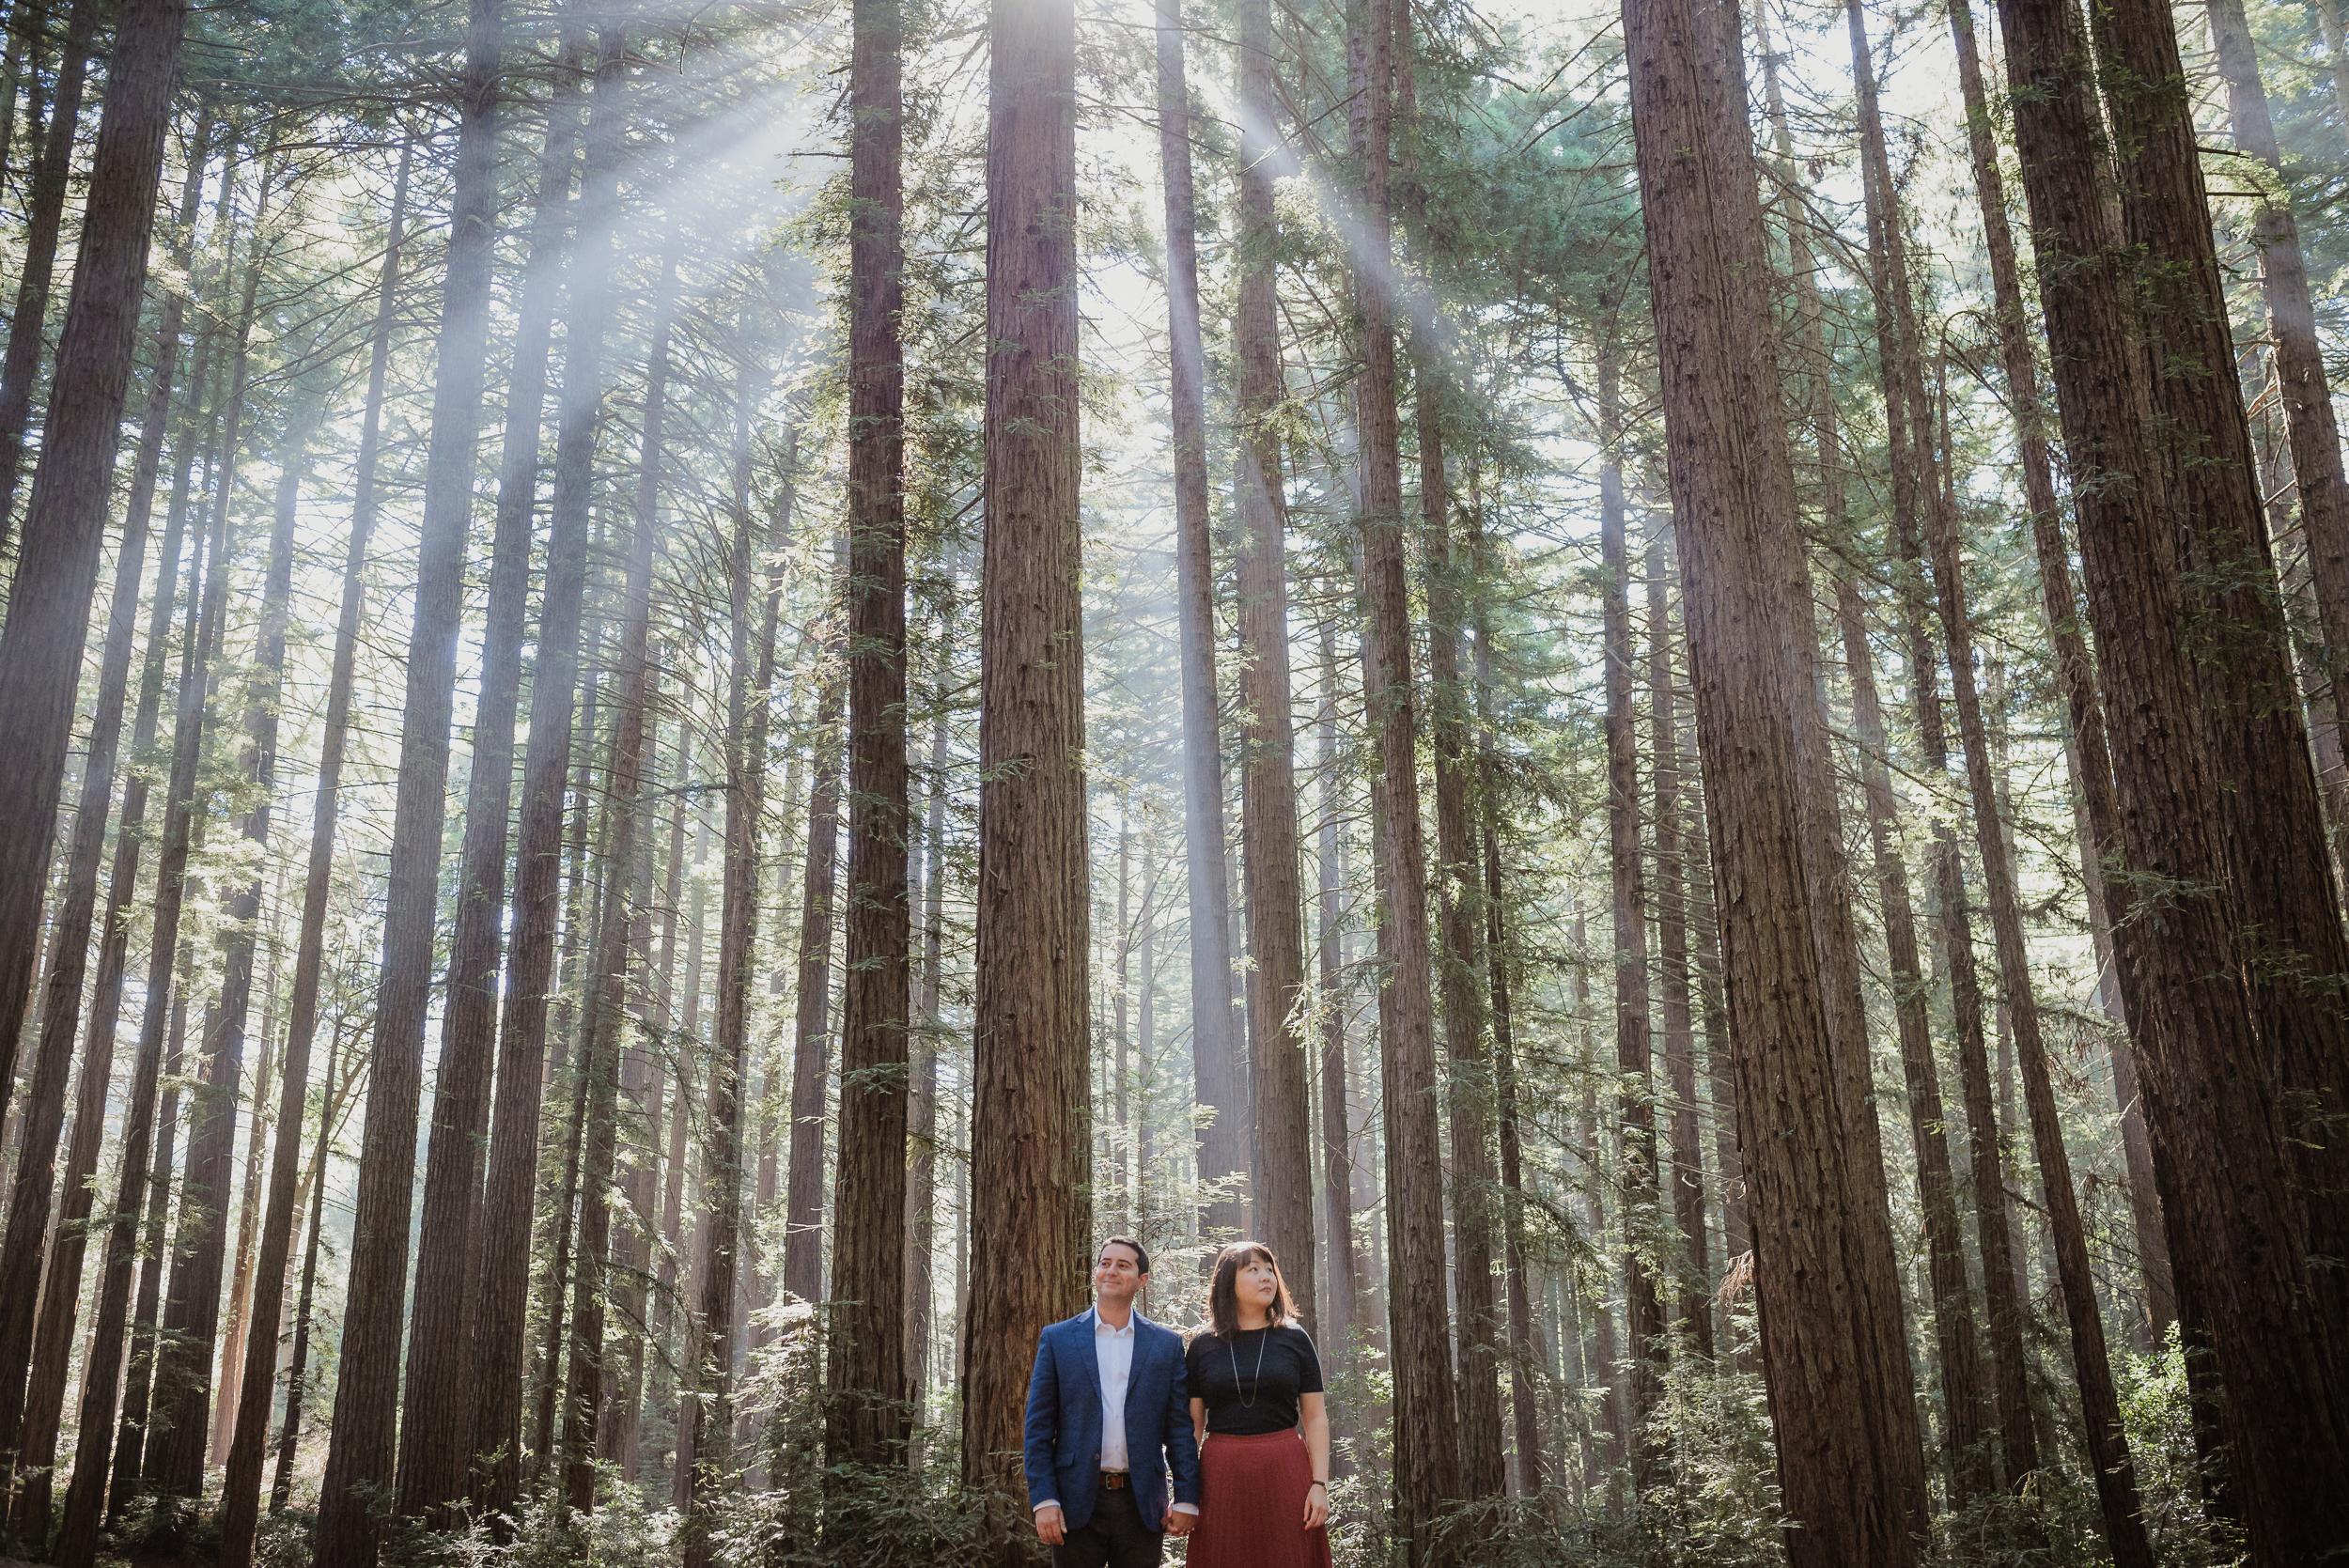 oakland-redwood-engagement-session-photographer-vivianchen-035.jpg